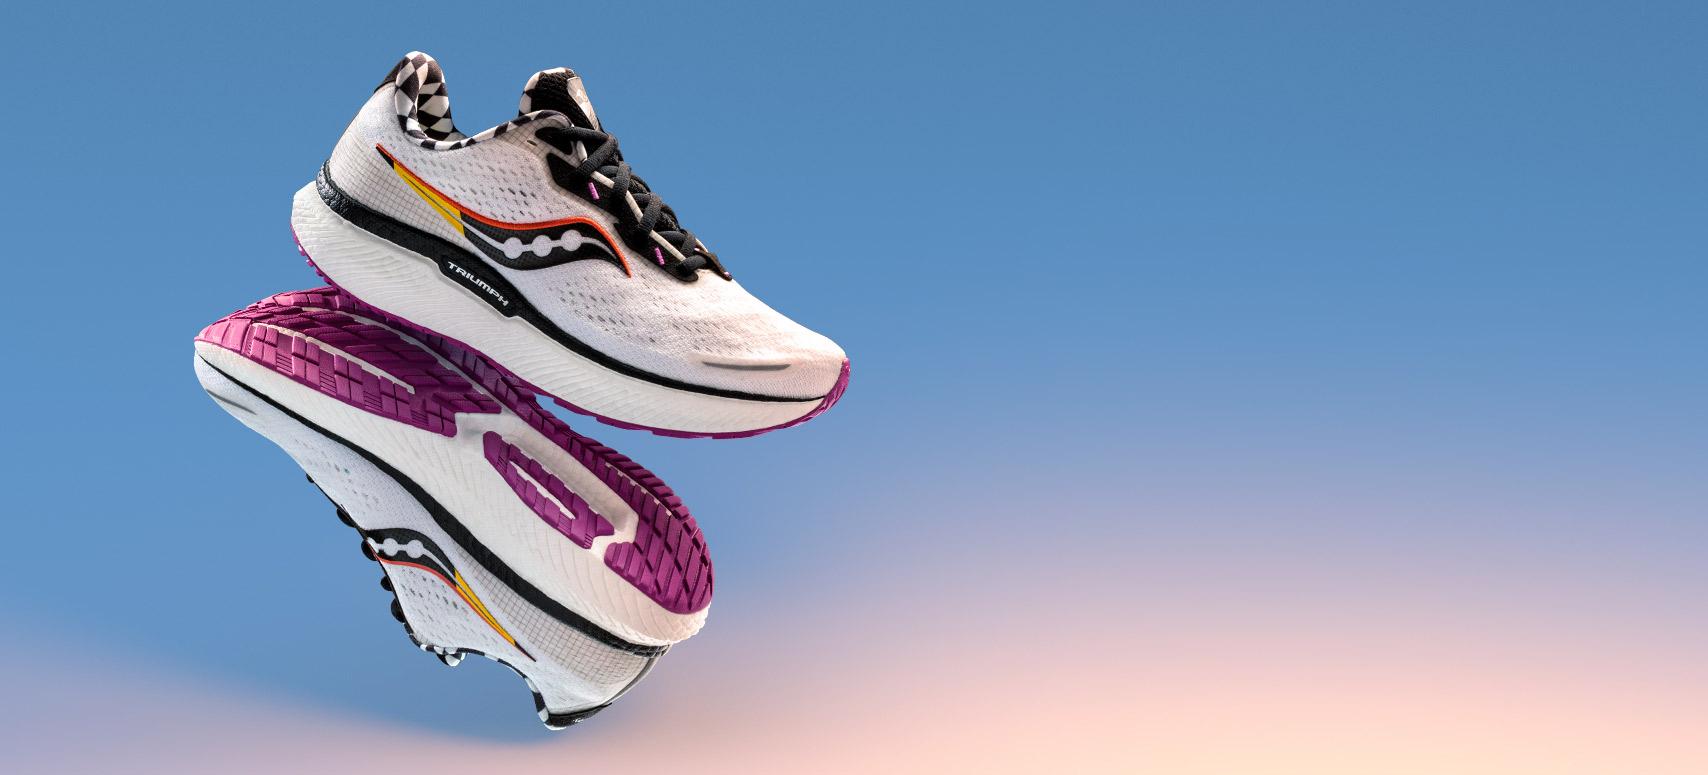 Triumph 19 running shoes.